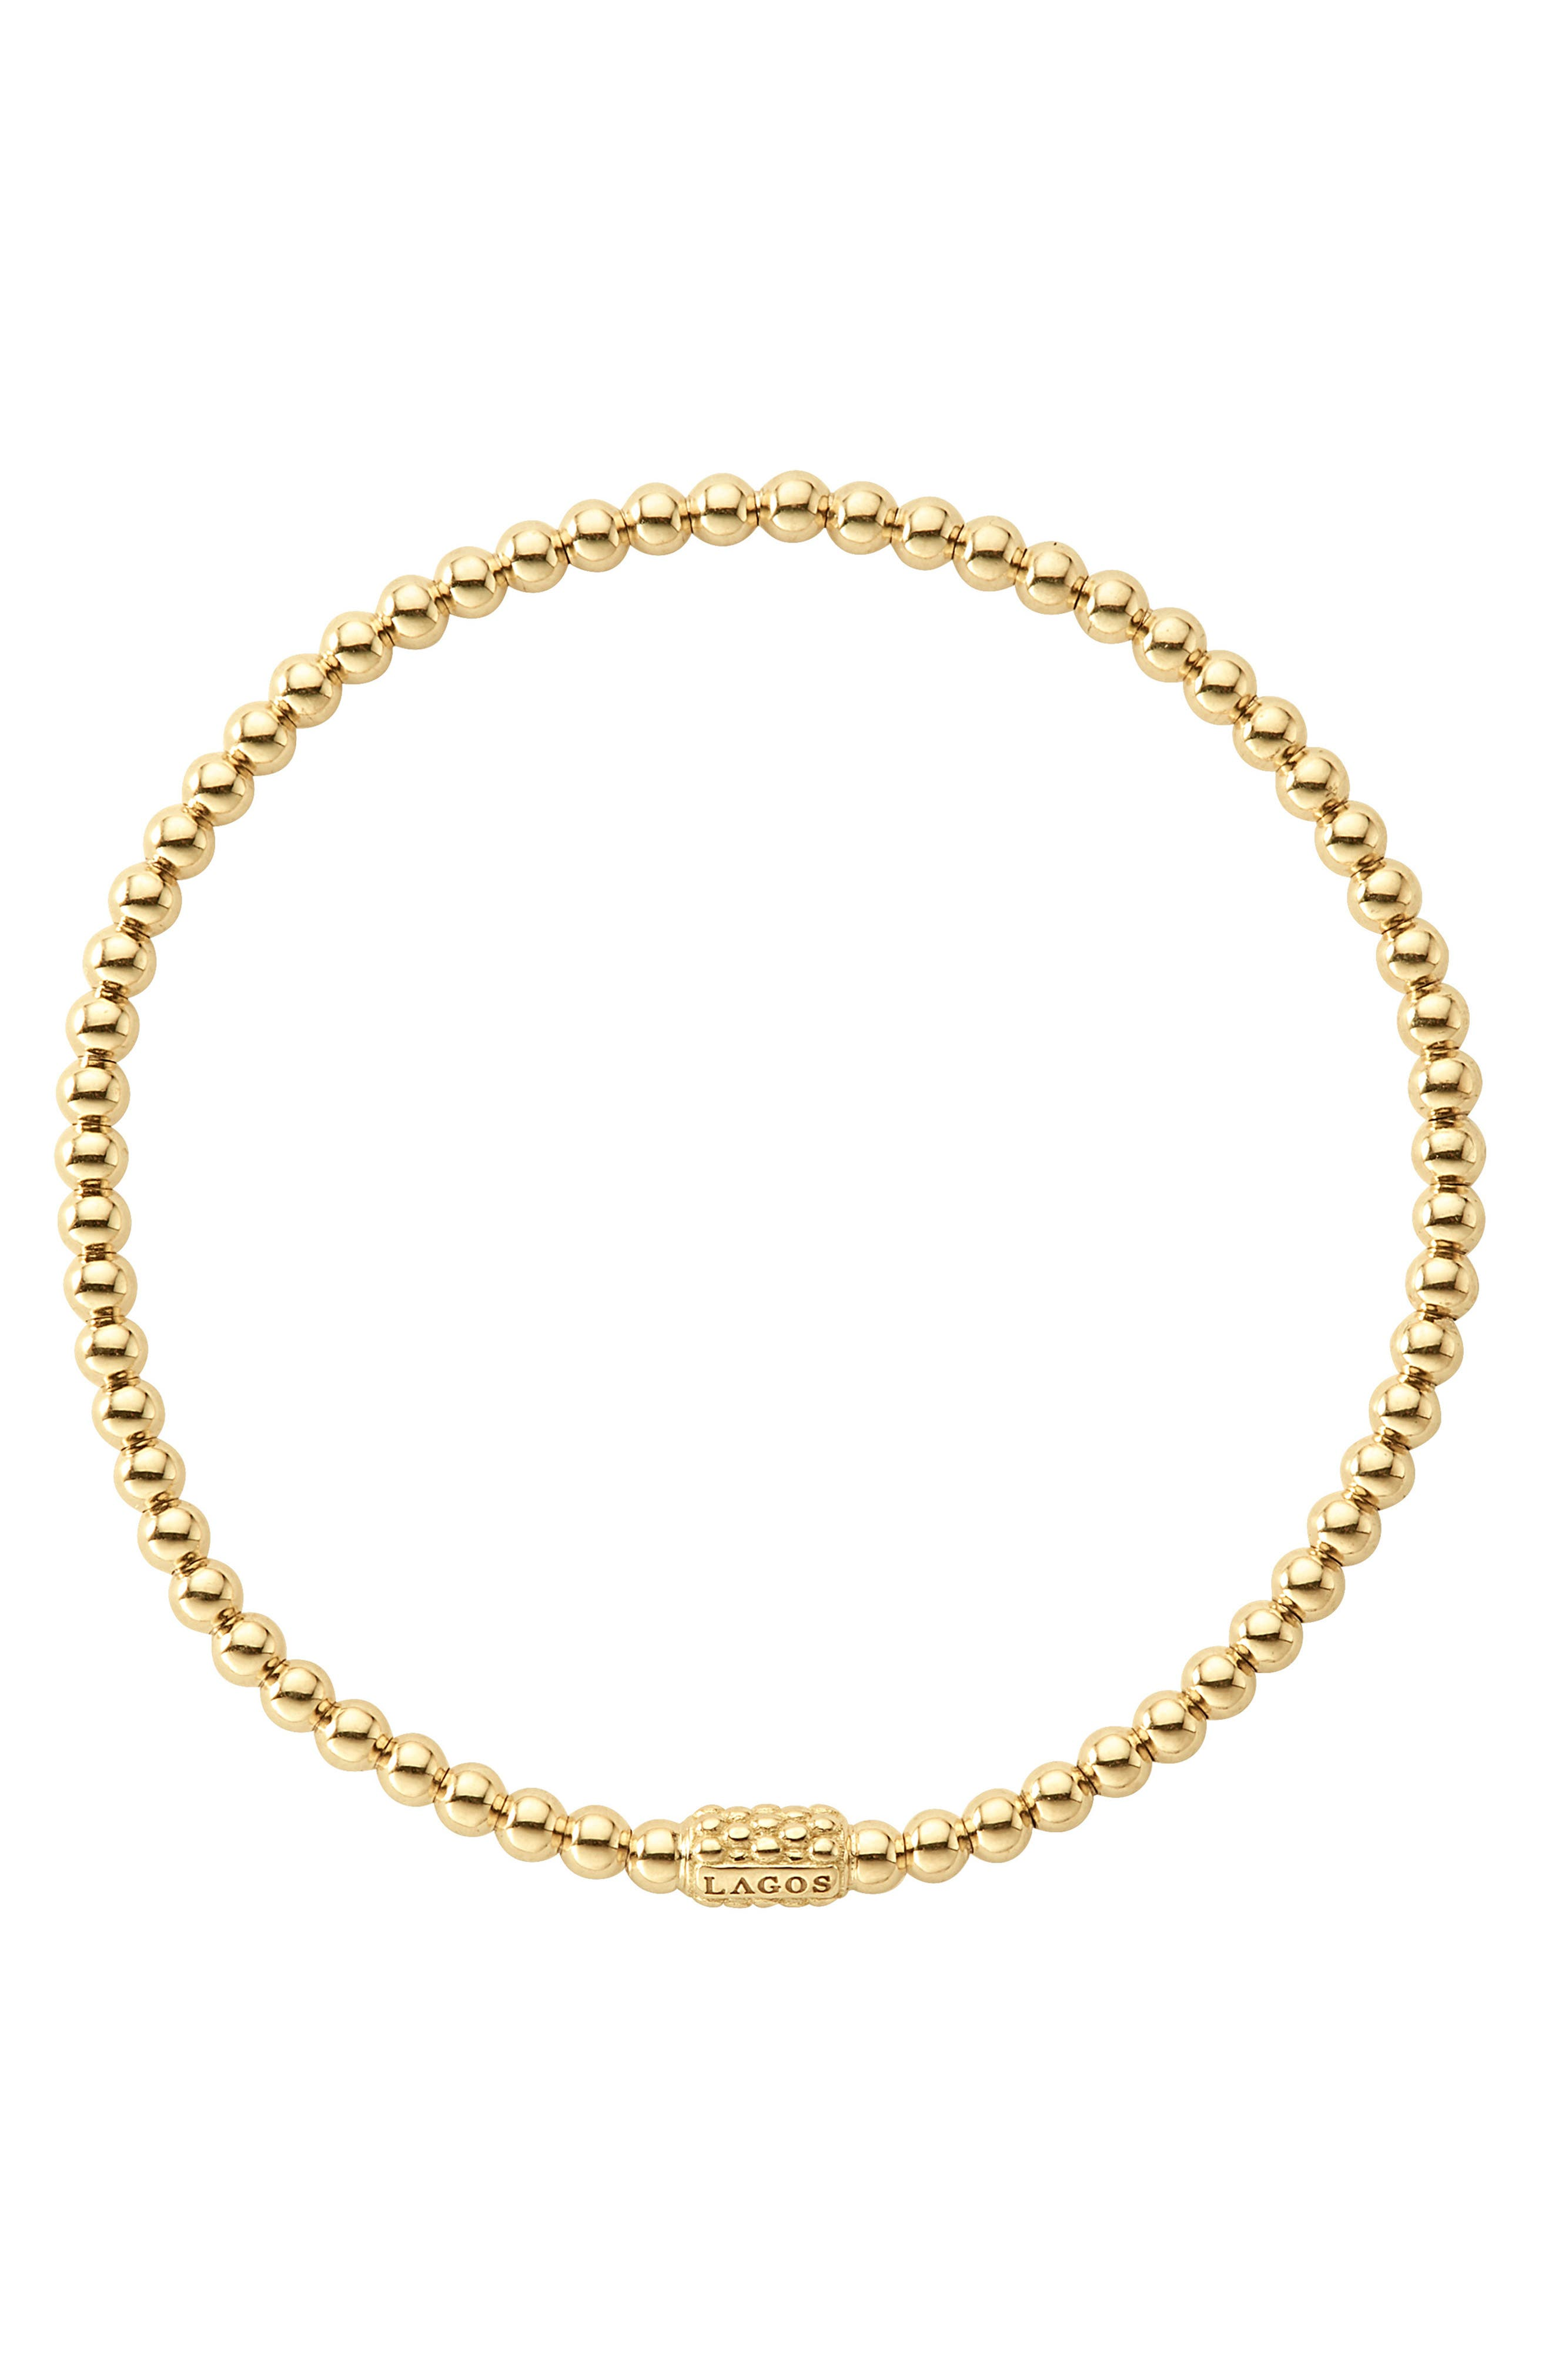 Caviar Gold Ball Stretch Bracelet,                             Alternate thumbnail 4, color,                             Gold